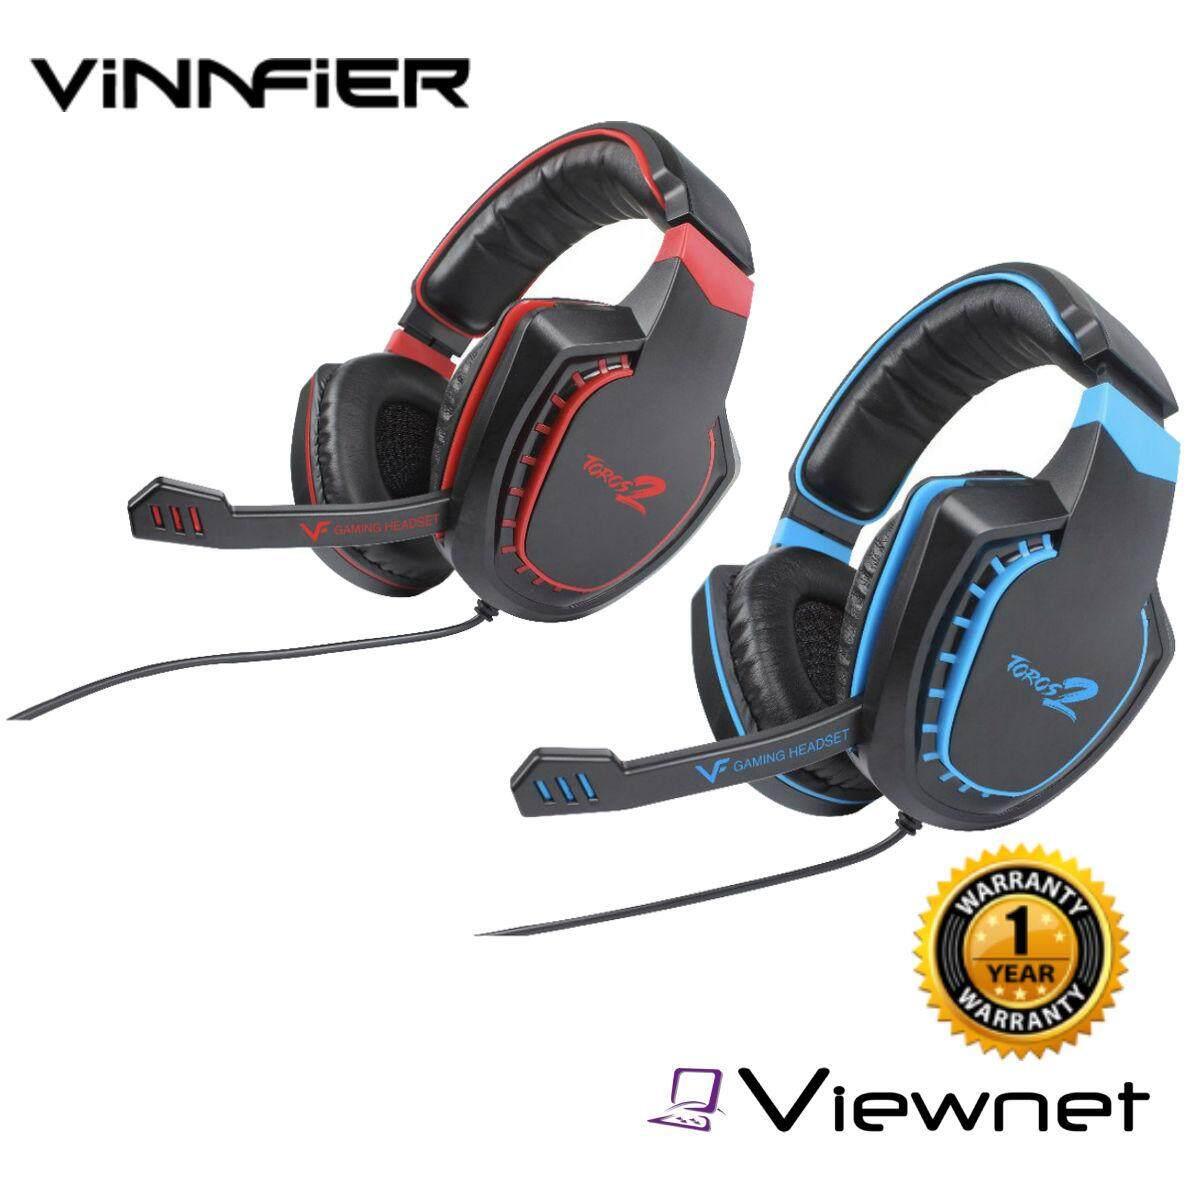 Vinnfier 3.5MM Analog Gaming 2.1 Toros 2 Wired Headphone (Black Red/Black Blue)